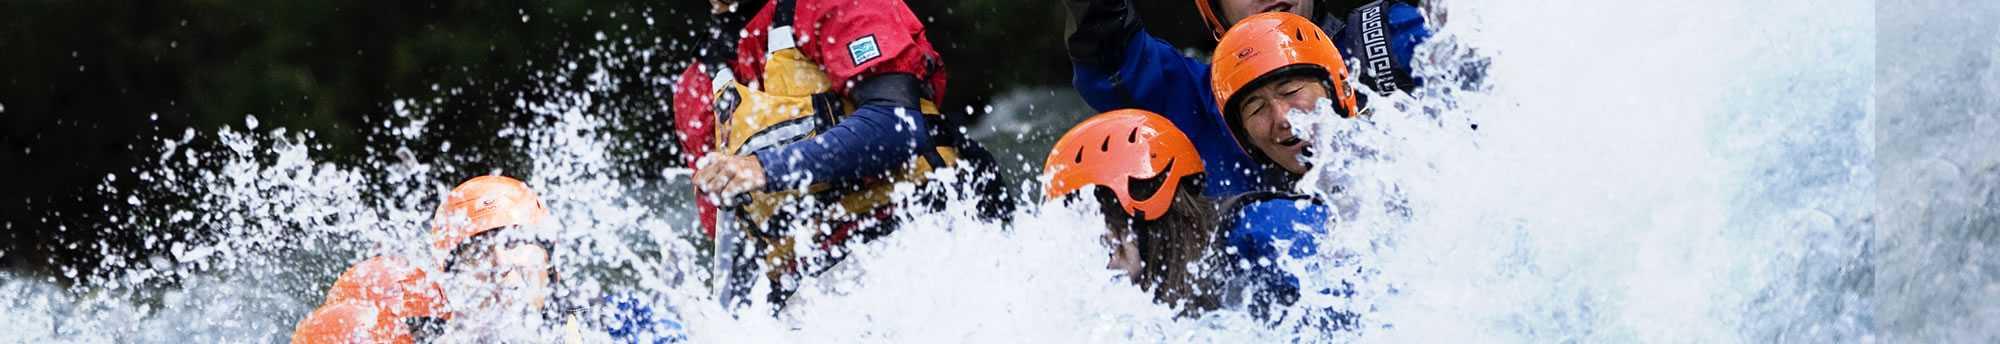 Rafting Noguera - Valle de Boi